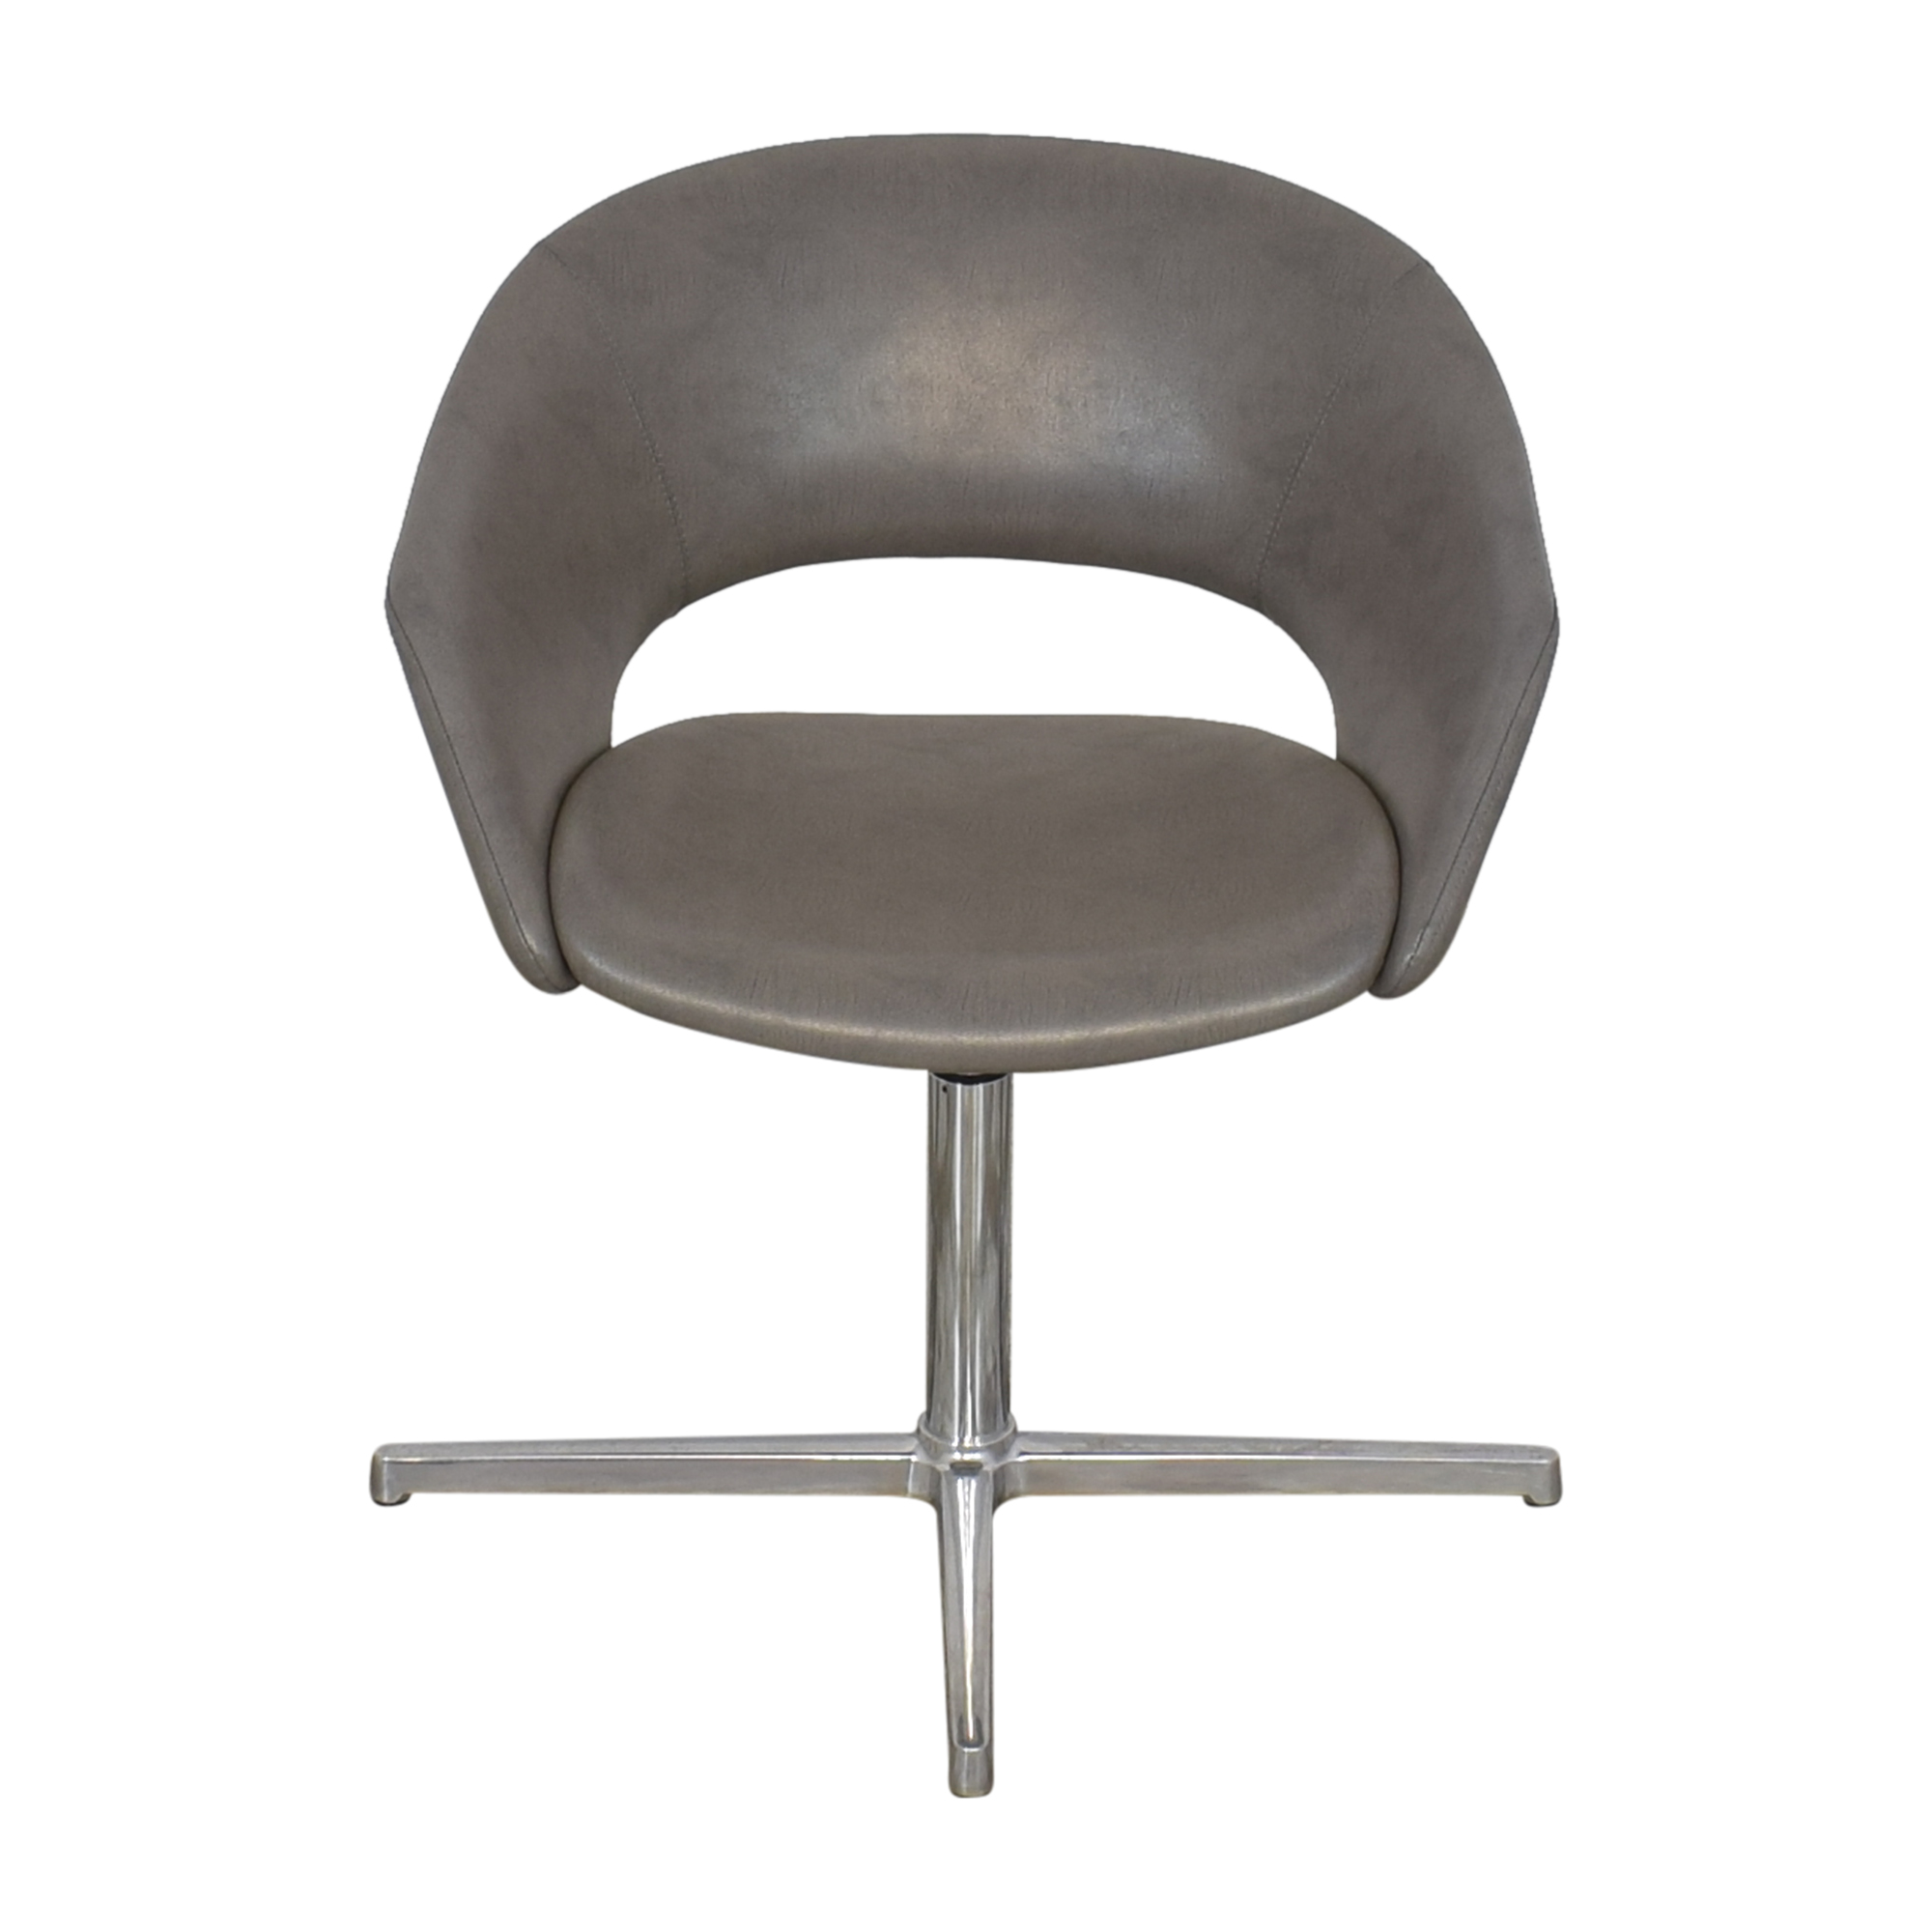 Leland International Leland Mod Pedestal Swivel Chair coupon